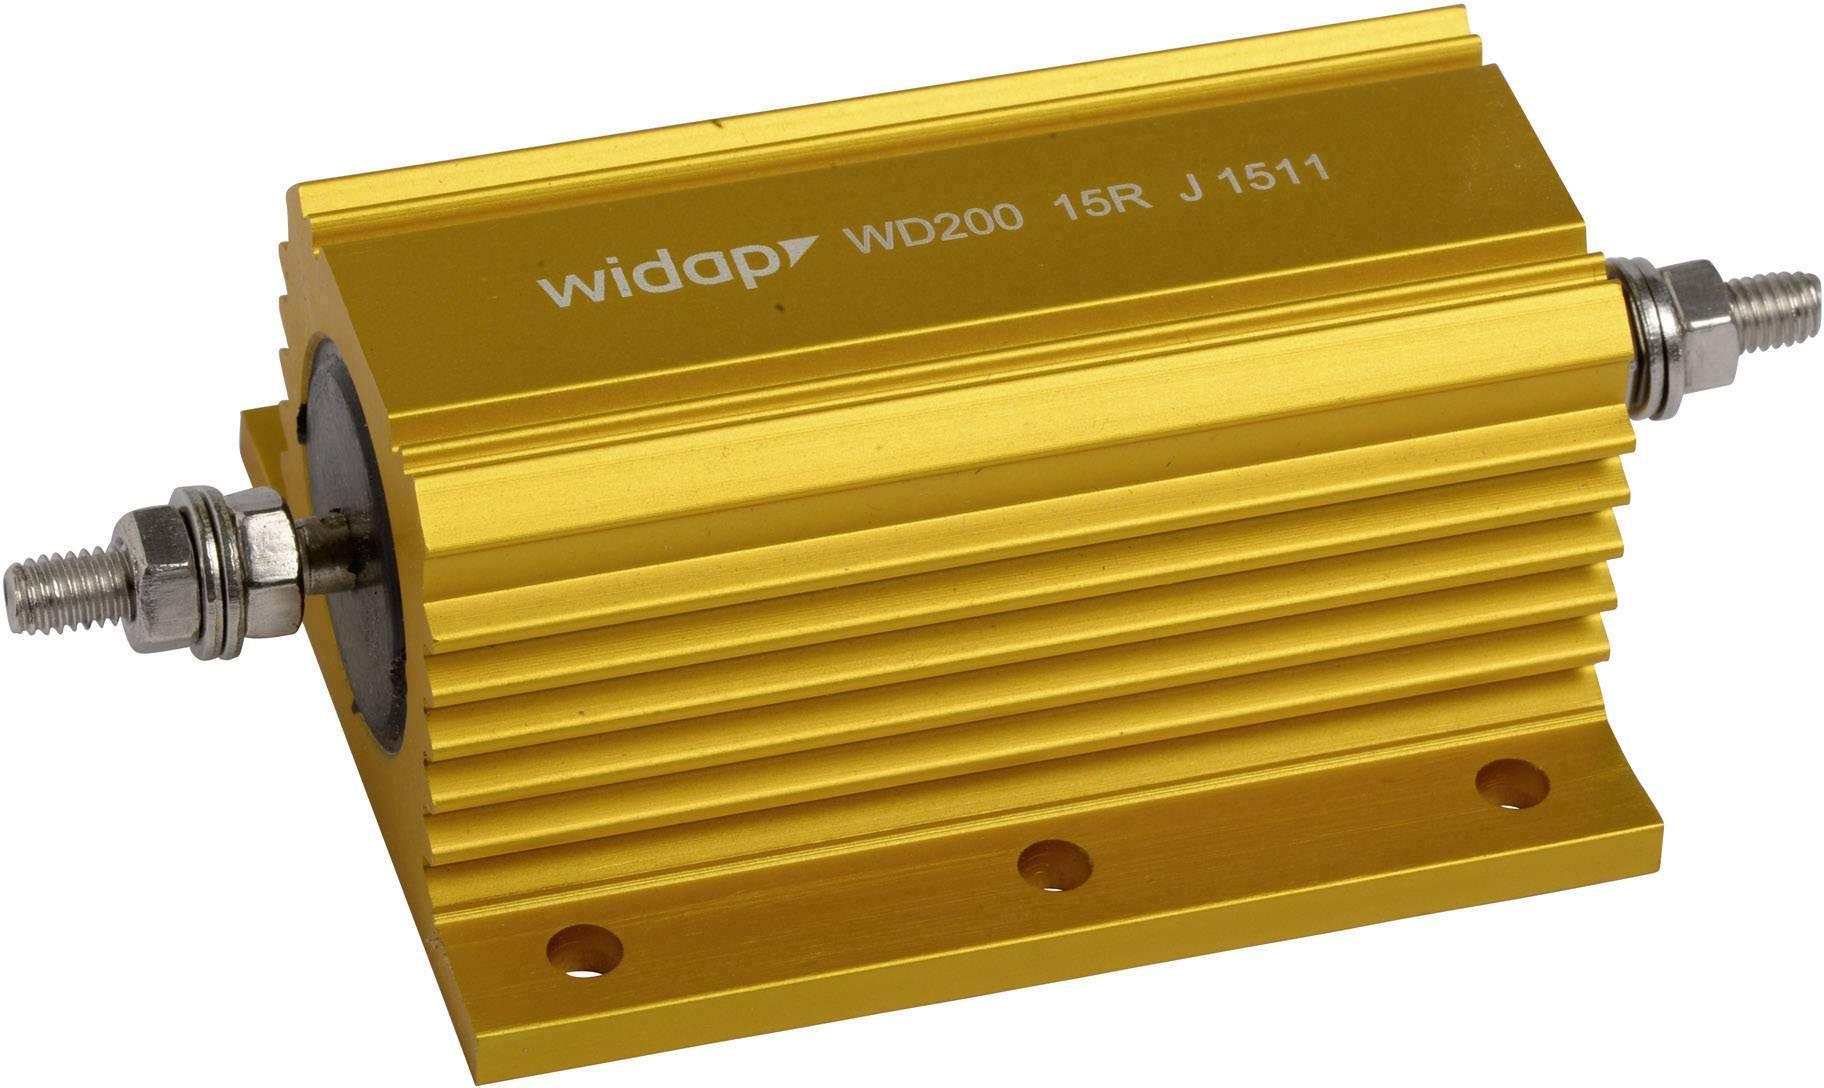 Drôtový rezistor Widap 160169, hodnota odporu 2.2 Ohm, 300 W, 1 ks